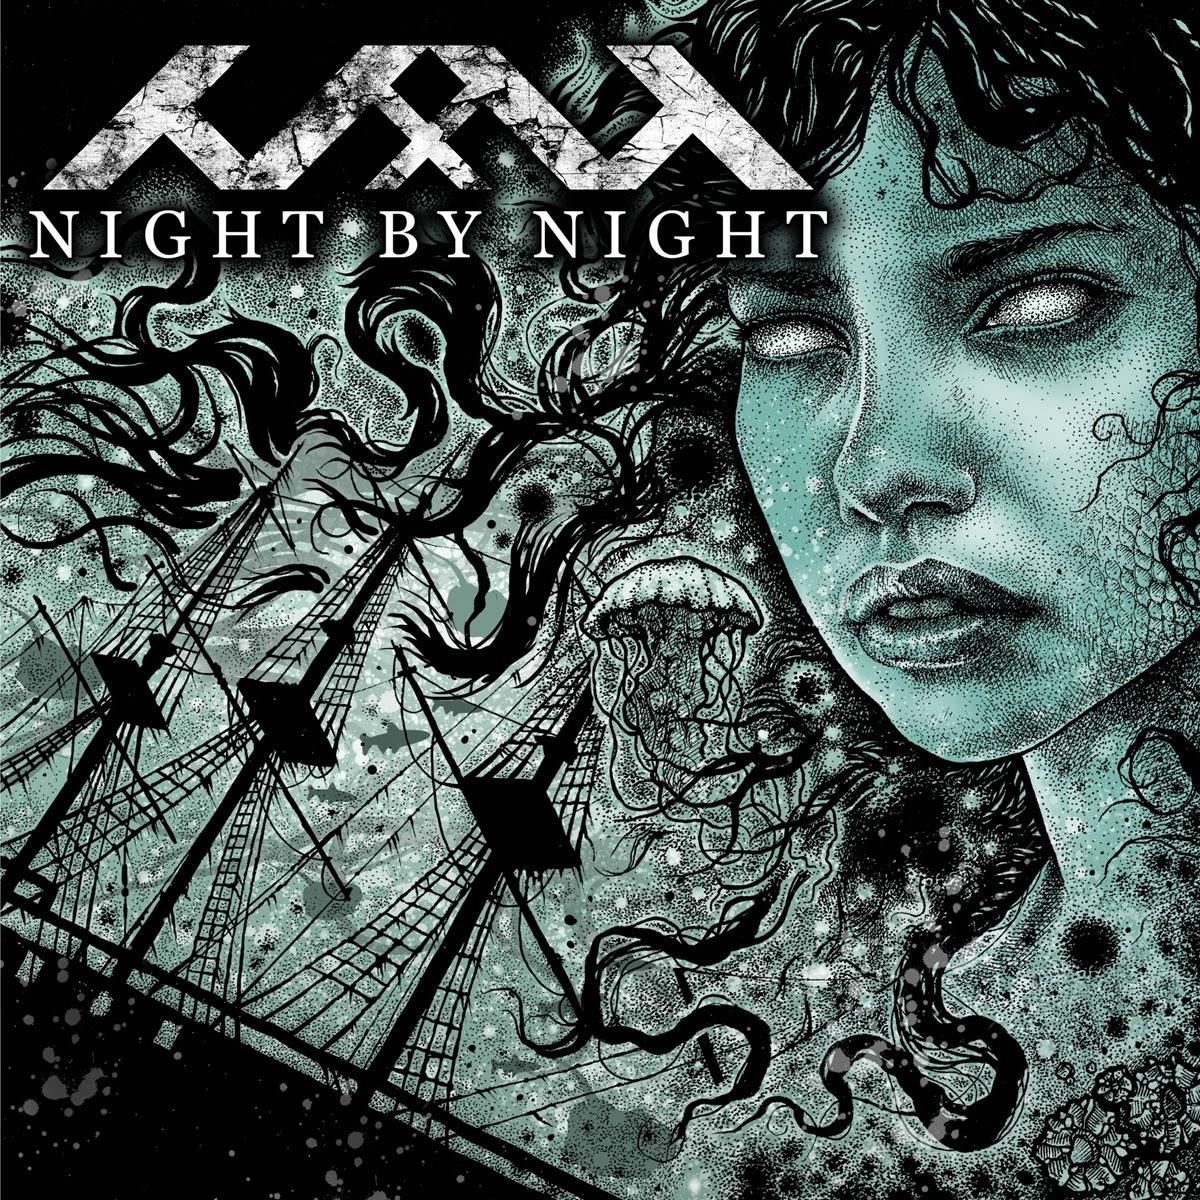 http://rock-and-metal-4-you.blogspot.de/2014/07/cd-review-night-by-night-nxn.html